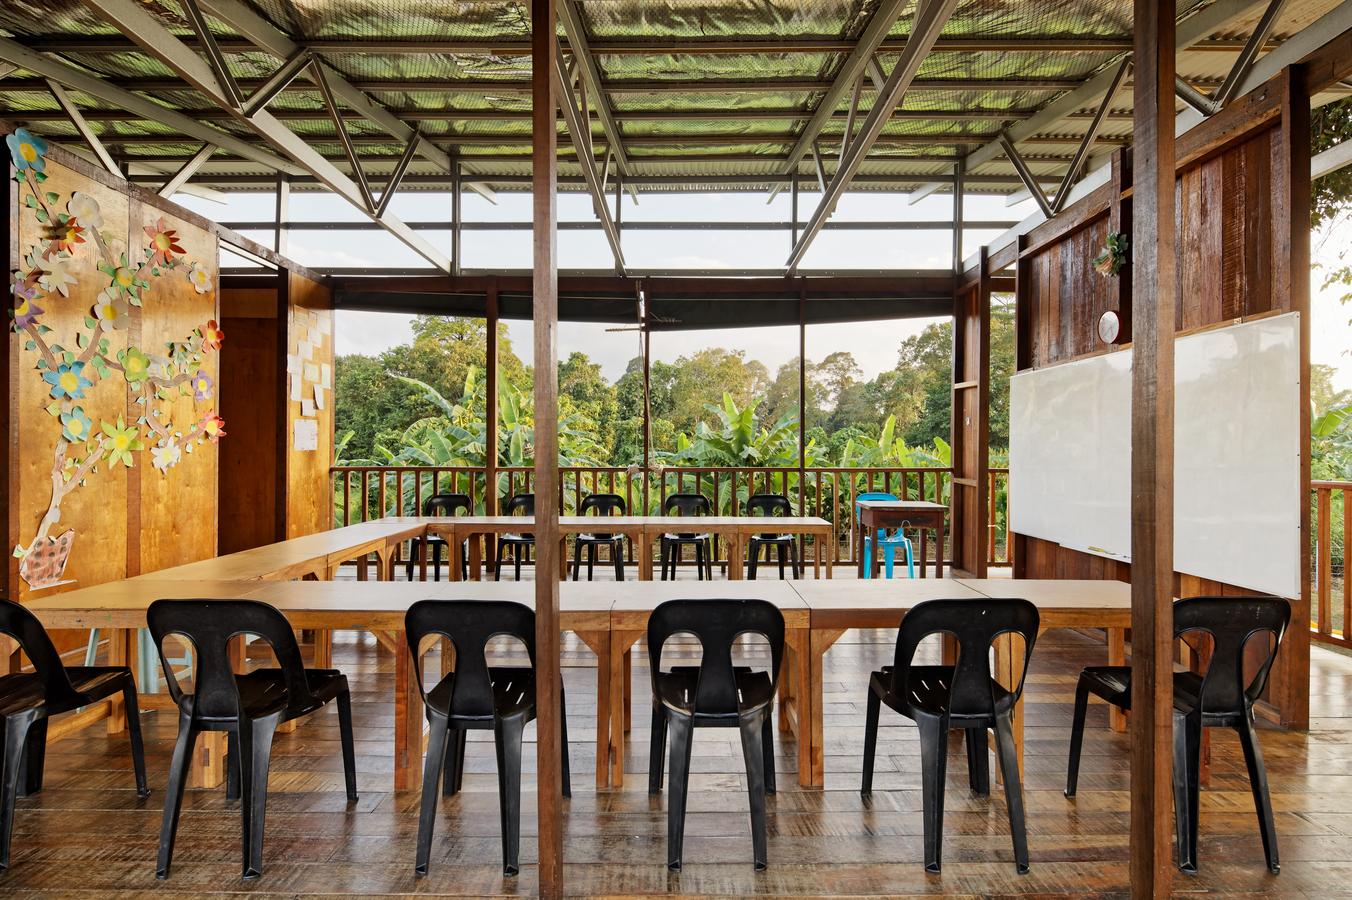 resized20_Architecture-BRIO_Etania_Matakana Learning Centre_153_East Classroom View 02.jpg